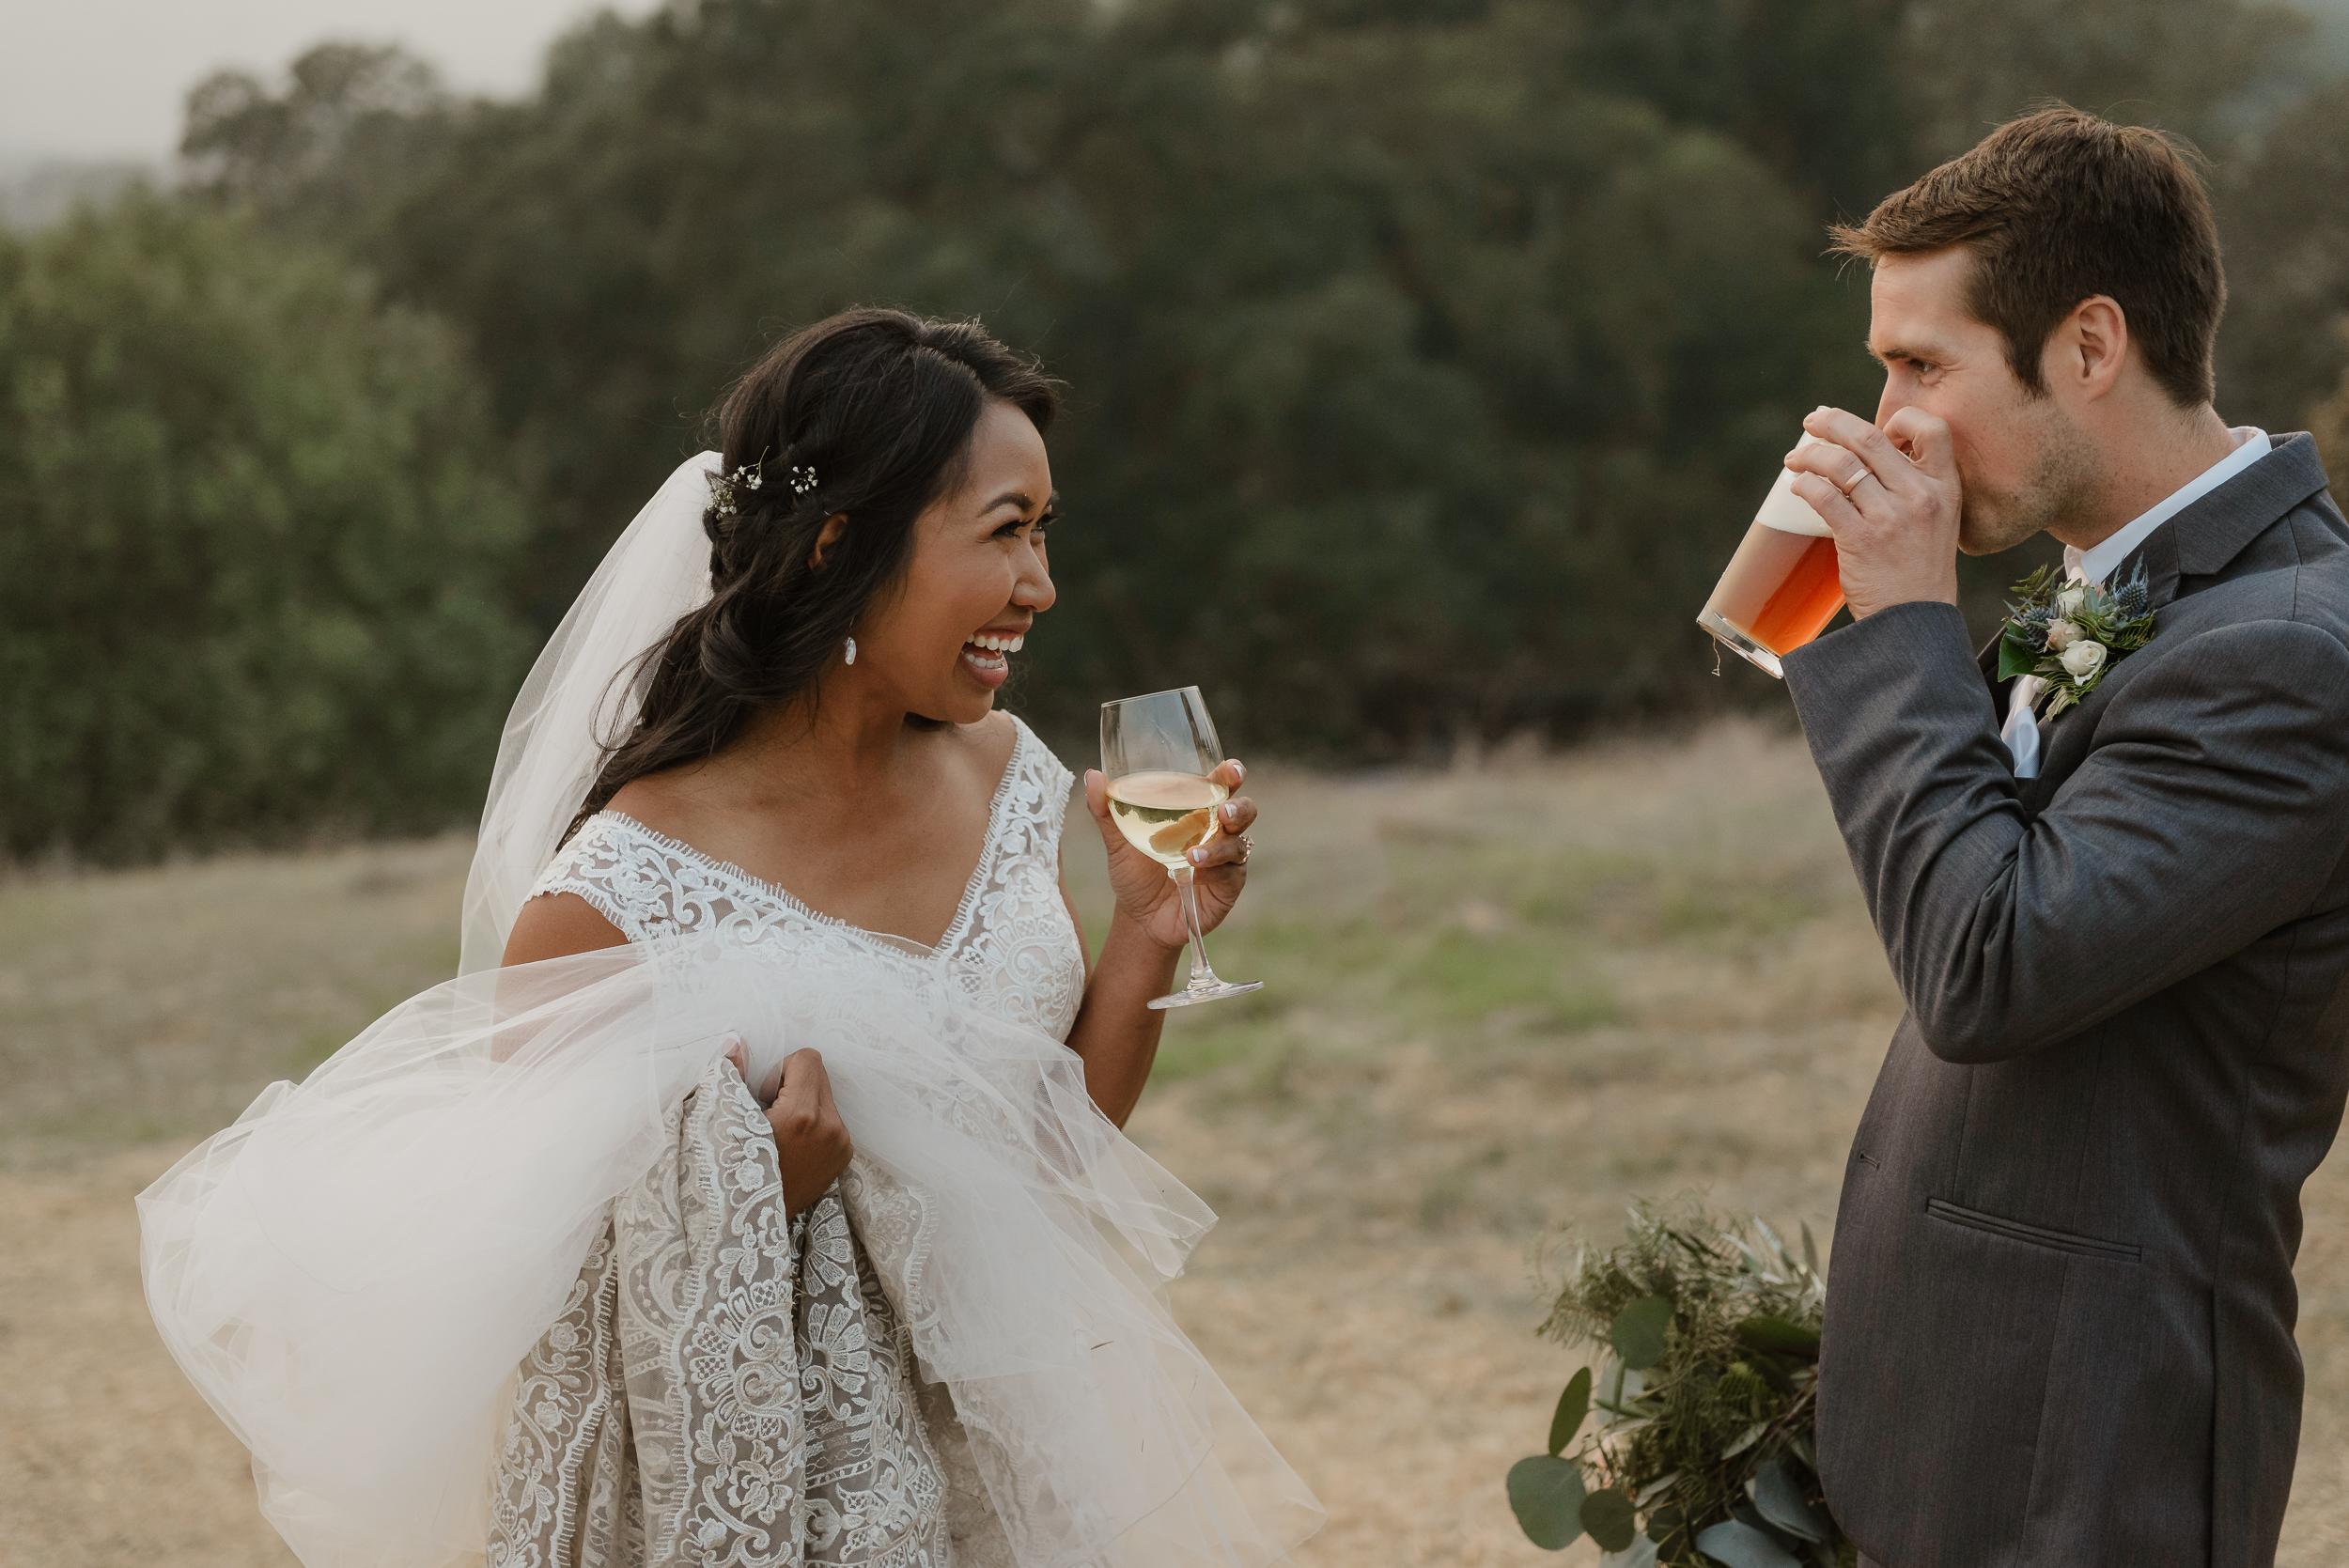 077marin-petaluma-backyard-wedding-vivianchen-530.jpg